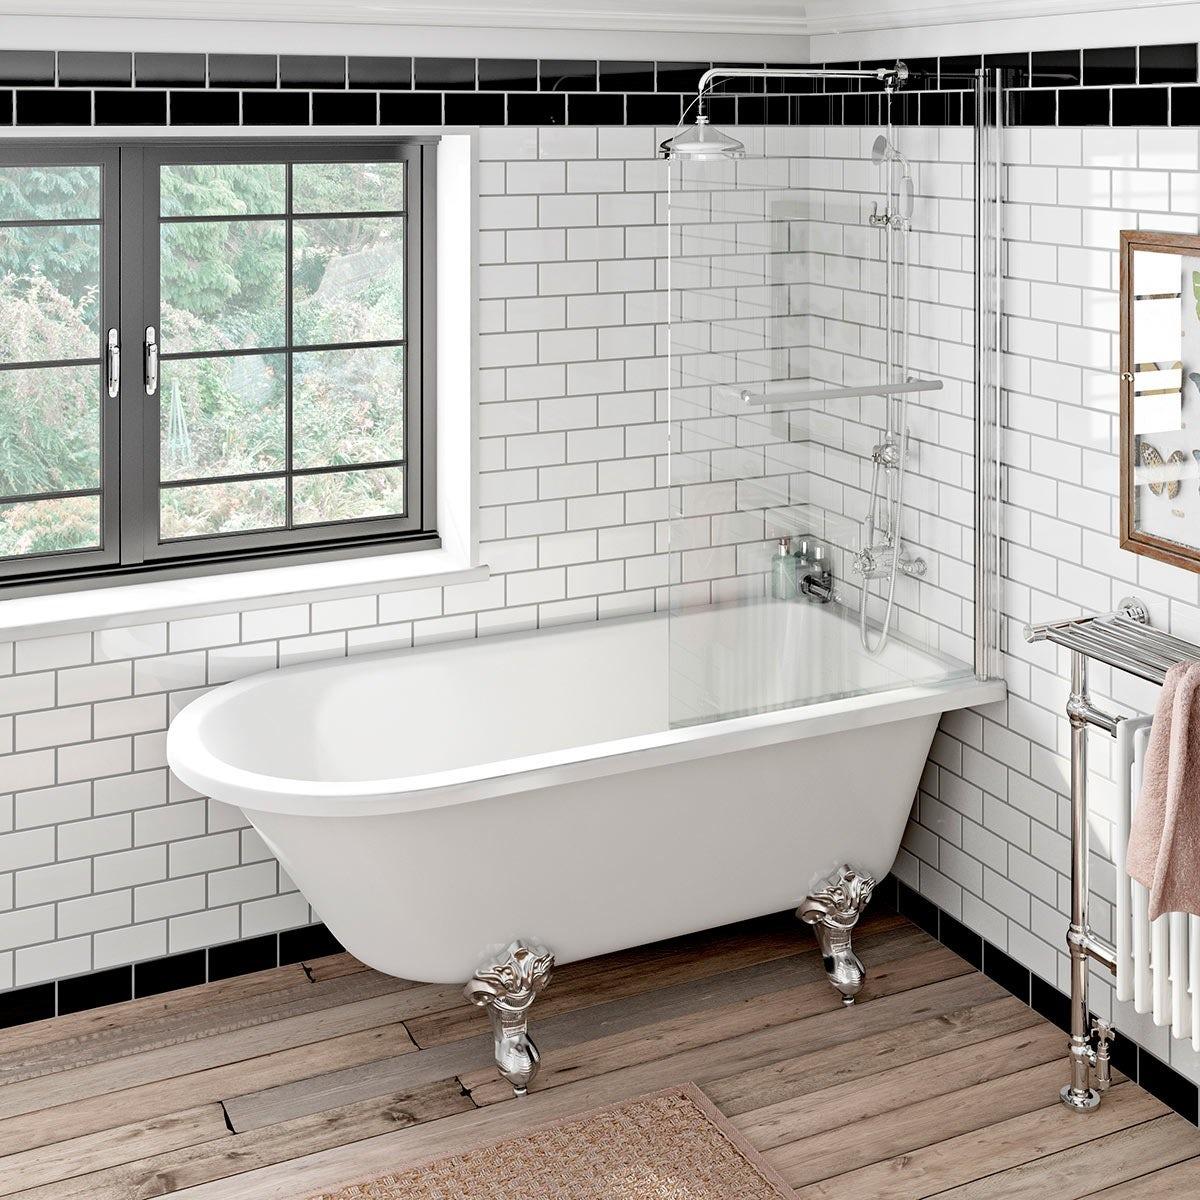 Orchard Dulwich freestanding shower bath and bath screen